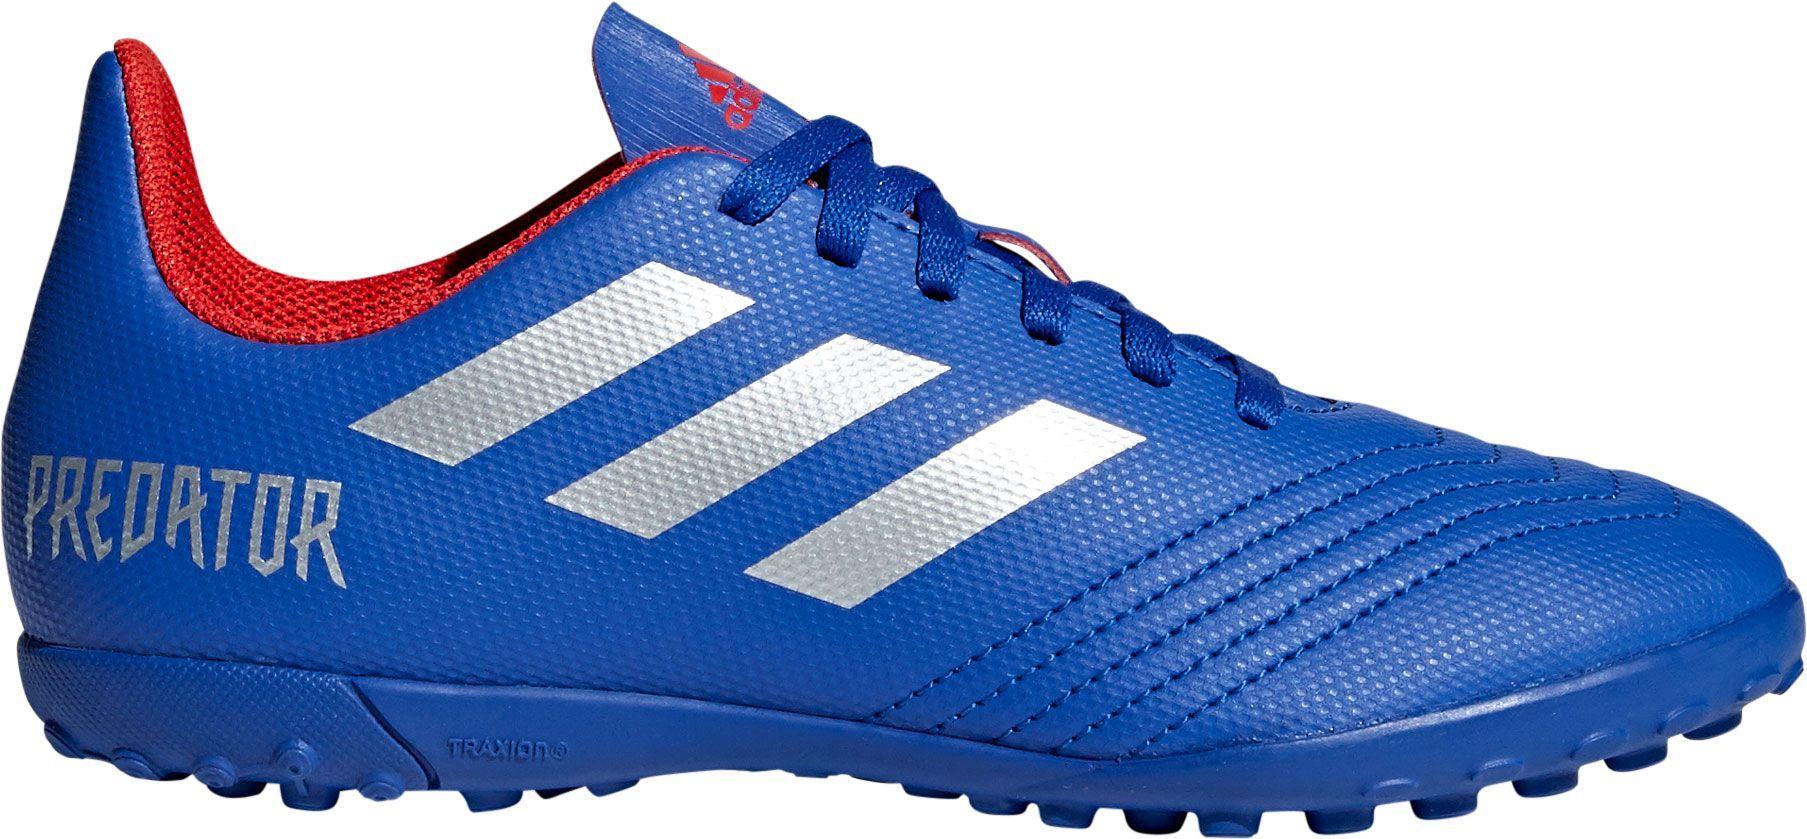 Adidas Predator 19.4 FxG Fußballschuh core black bright cyan